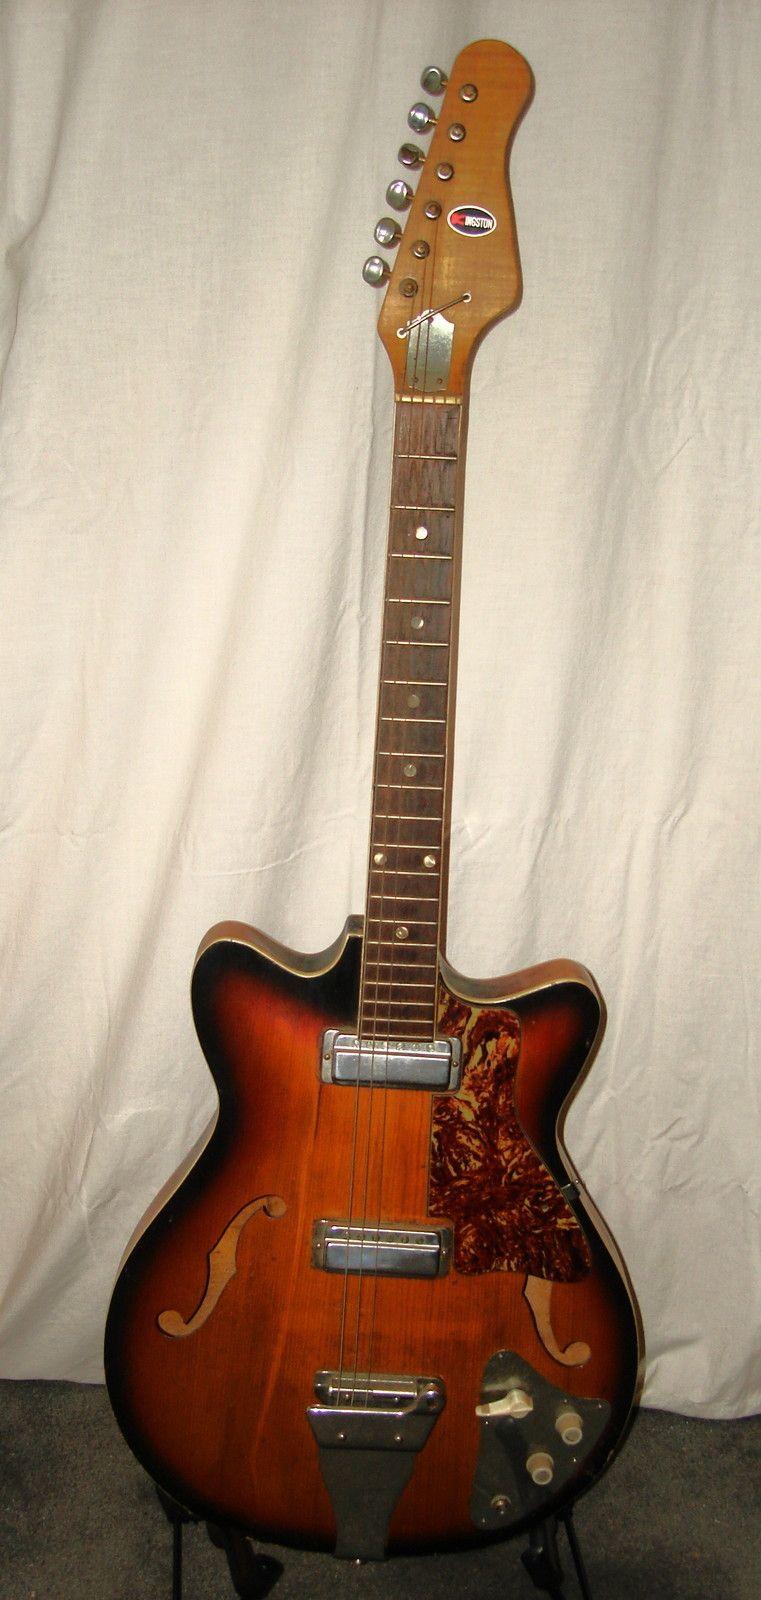 vintage 1960 39 s kingston hollow body f hole archtop electric guitar vintage guitars guitar. Black Bedroom Furniture Sets. Home Design Ideas